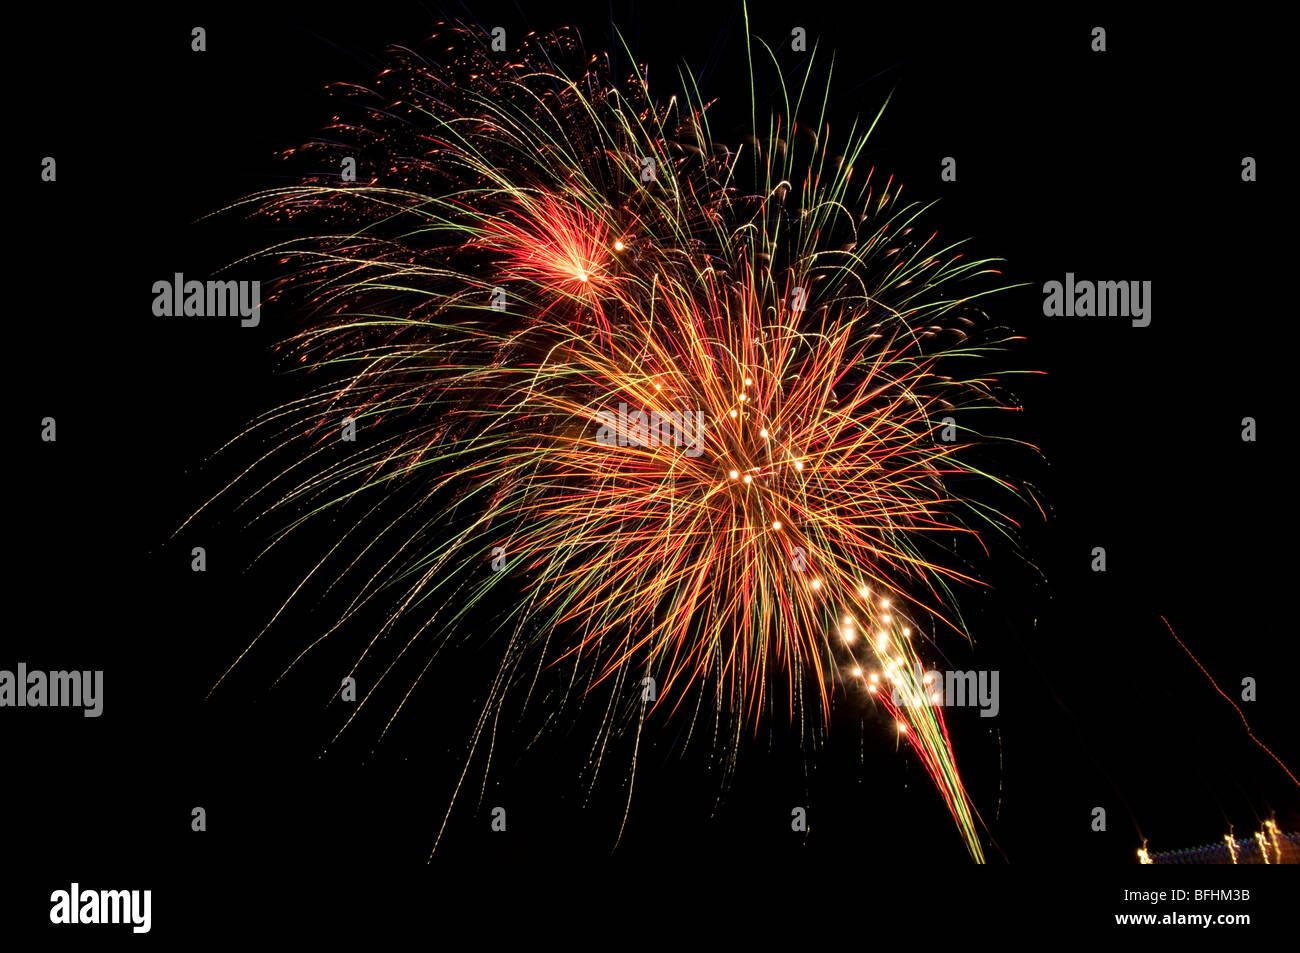 Europe, UK, england, kent, broadstairs 2009 fireworks - Stock Image